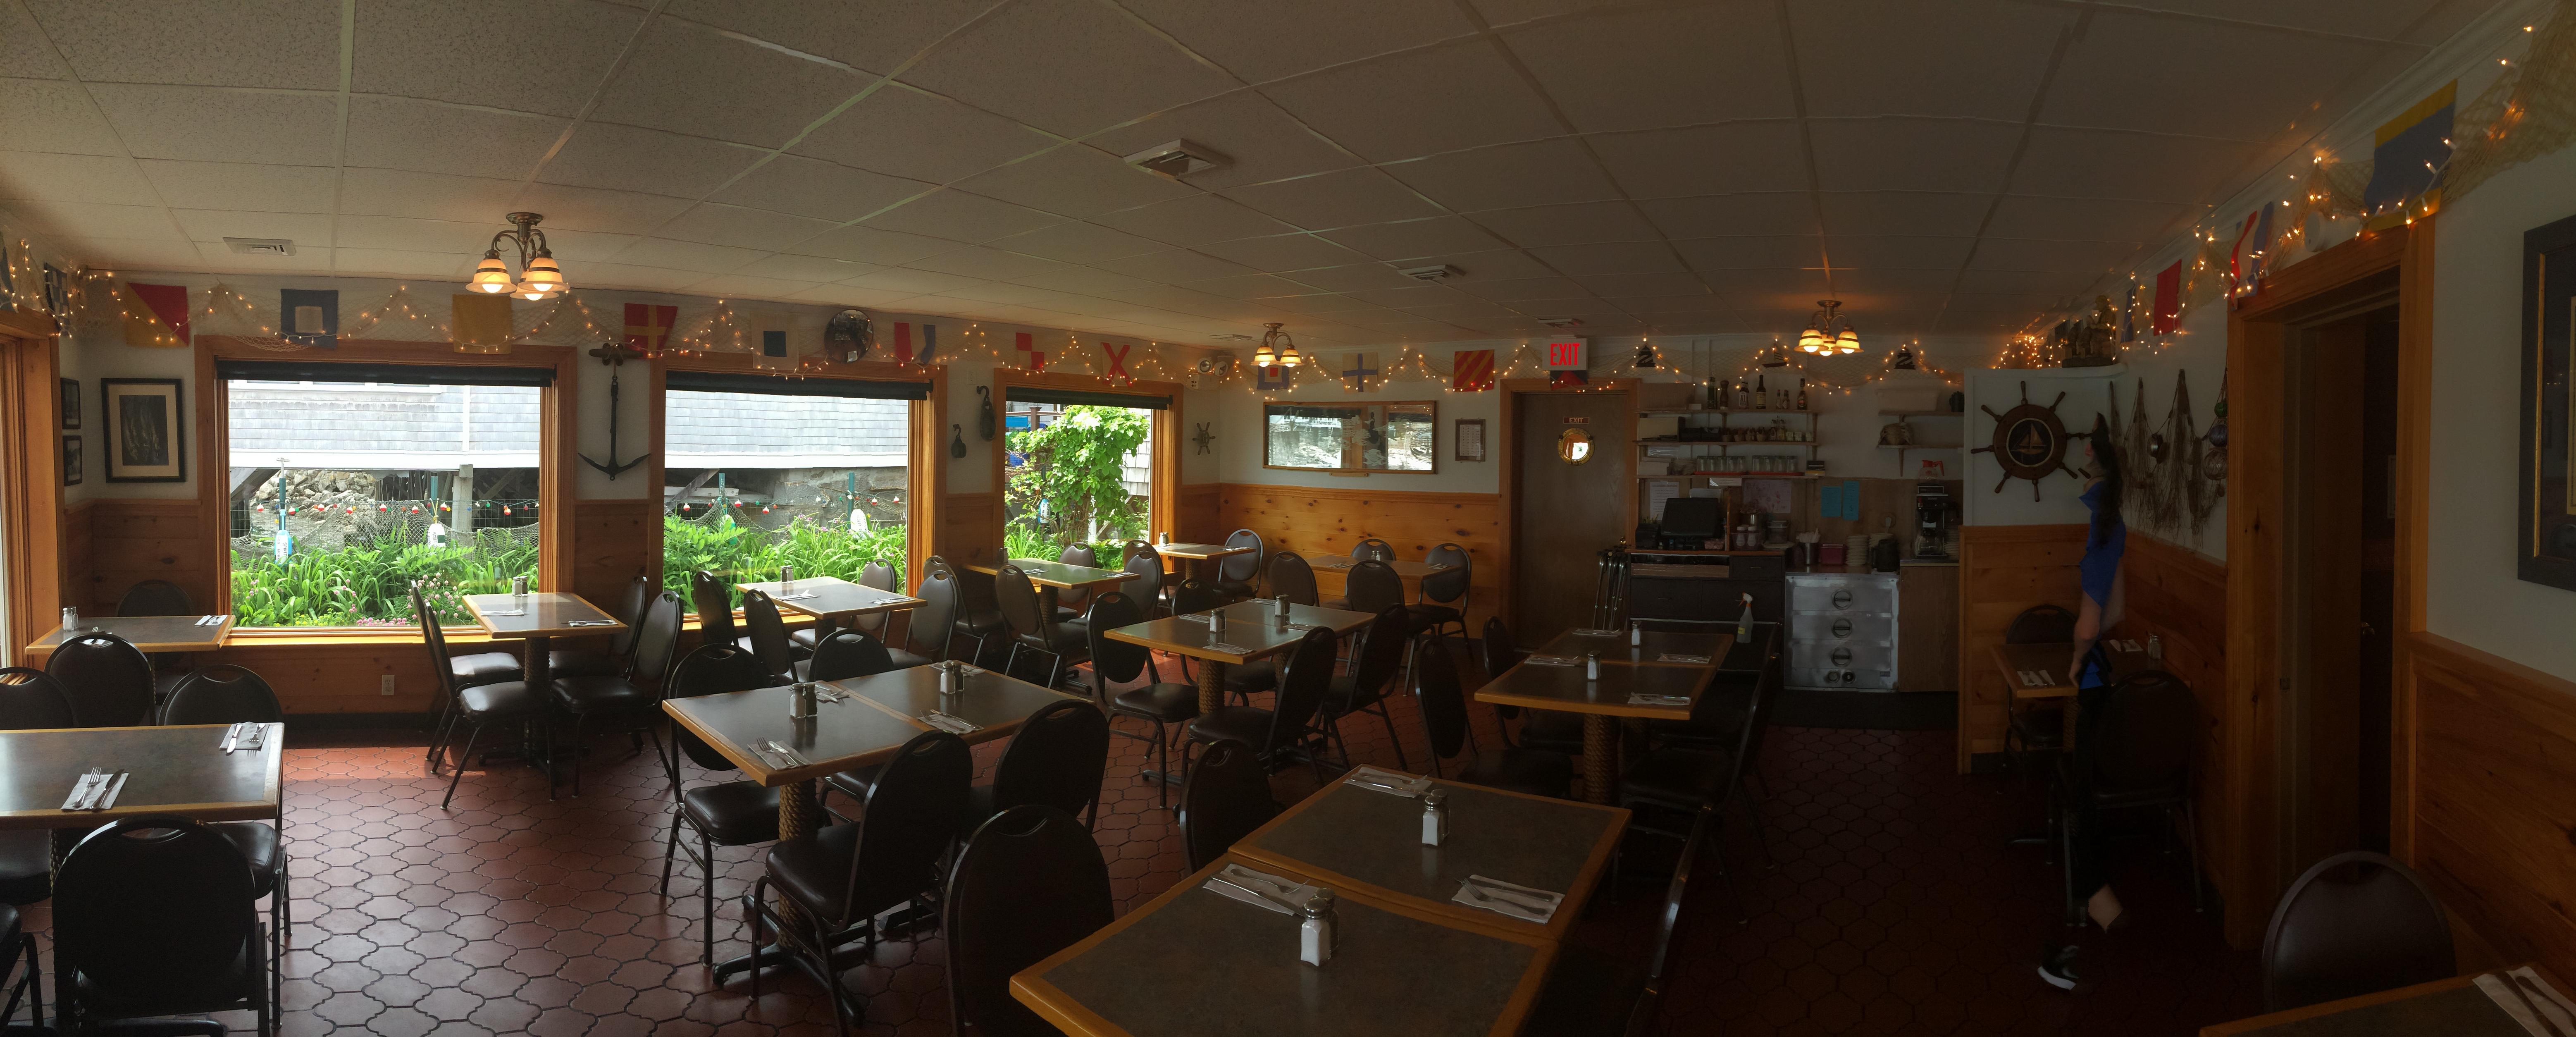 Ellens Harborside Restaurant In Rockport Massachusetts Amazing